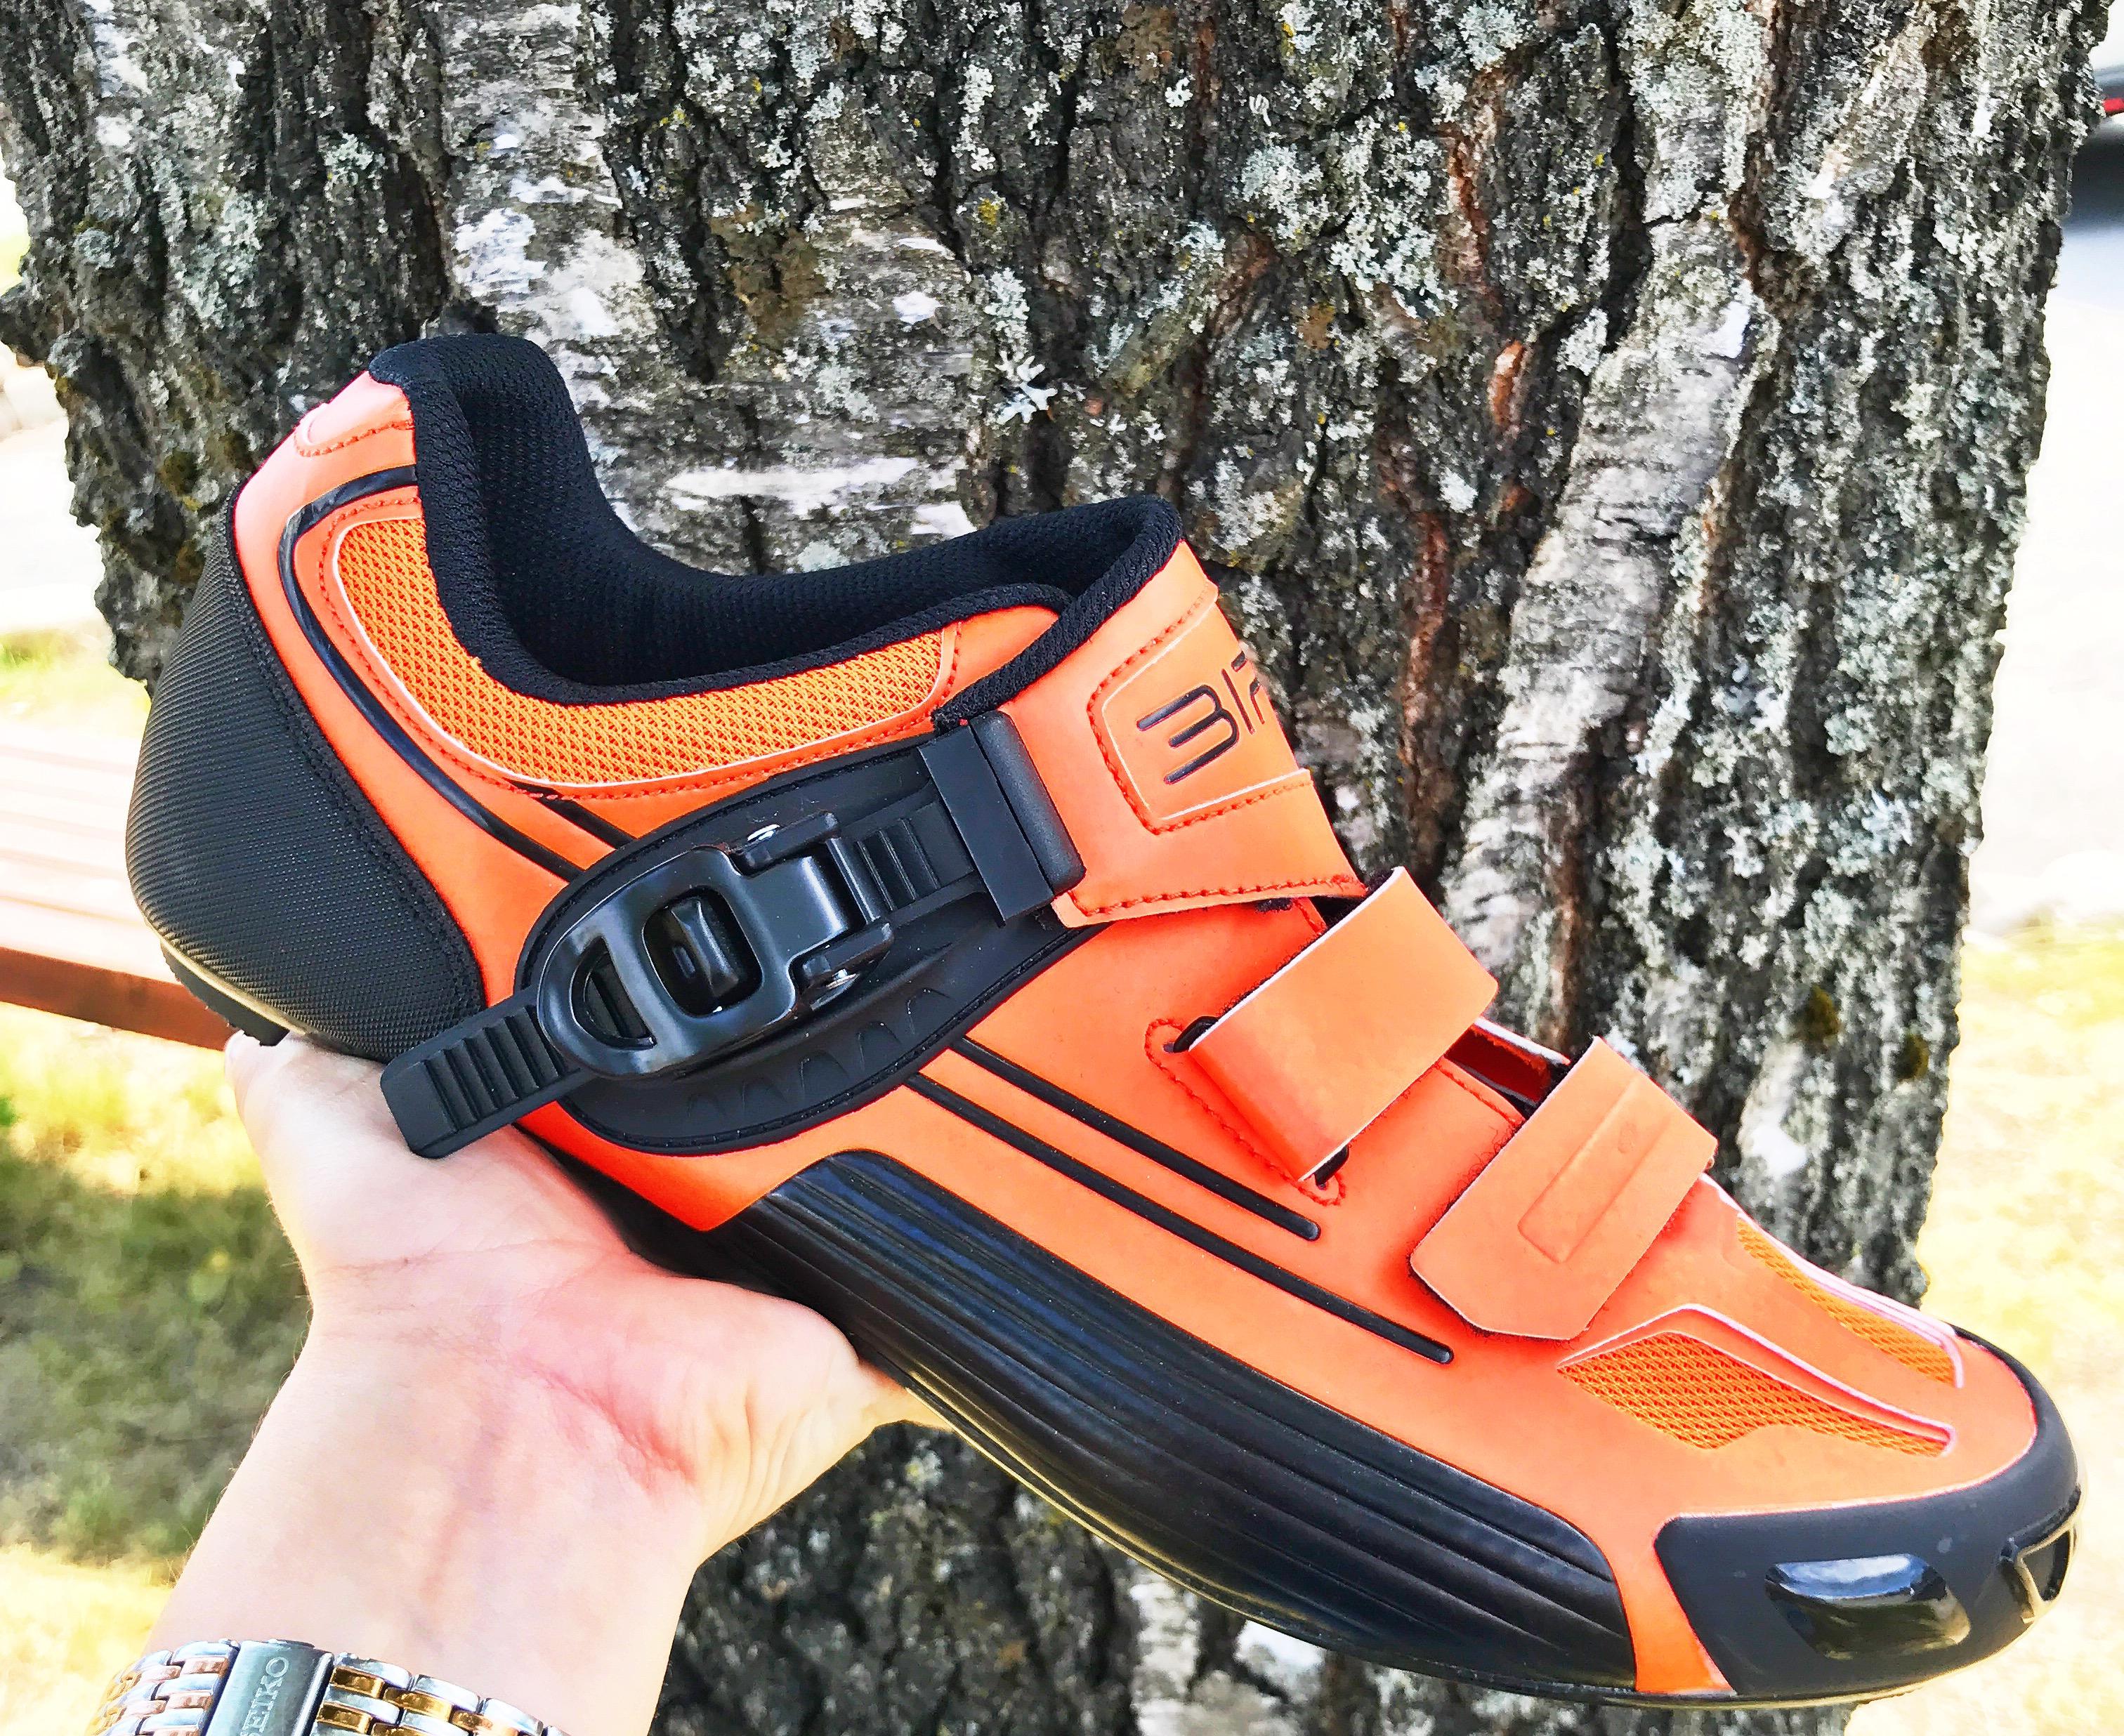 Birk 399 Carbon Landeveissko - Skoen som sikrer 100% passform!